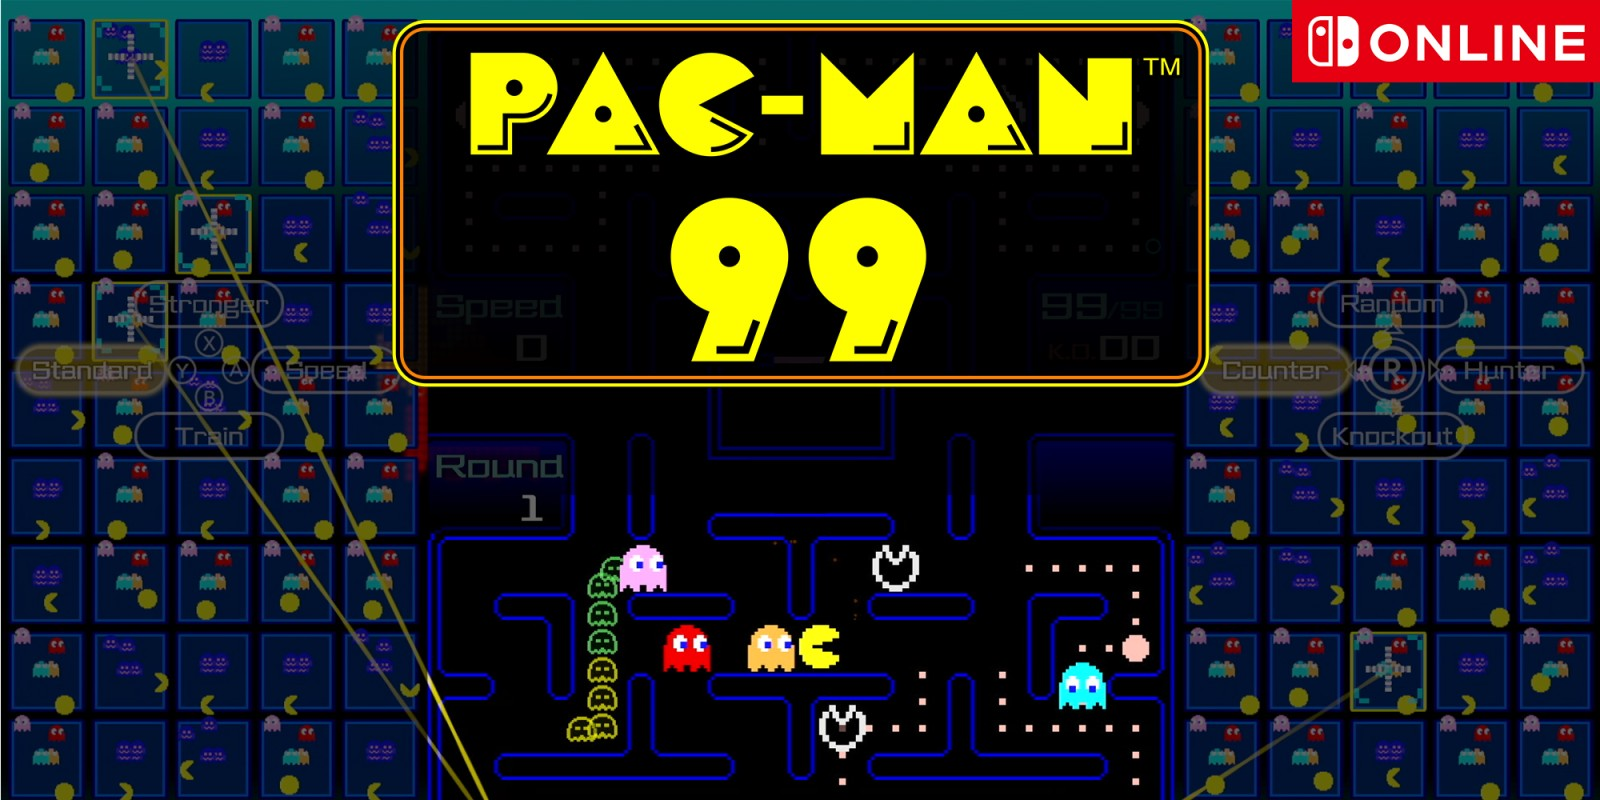 pac-man-99.jpg